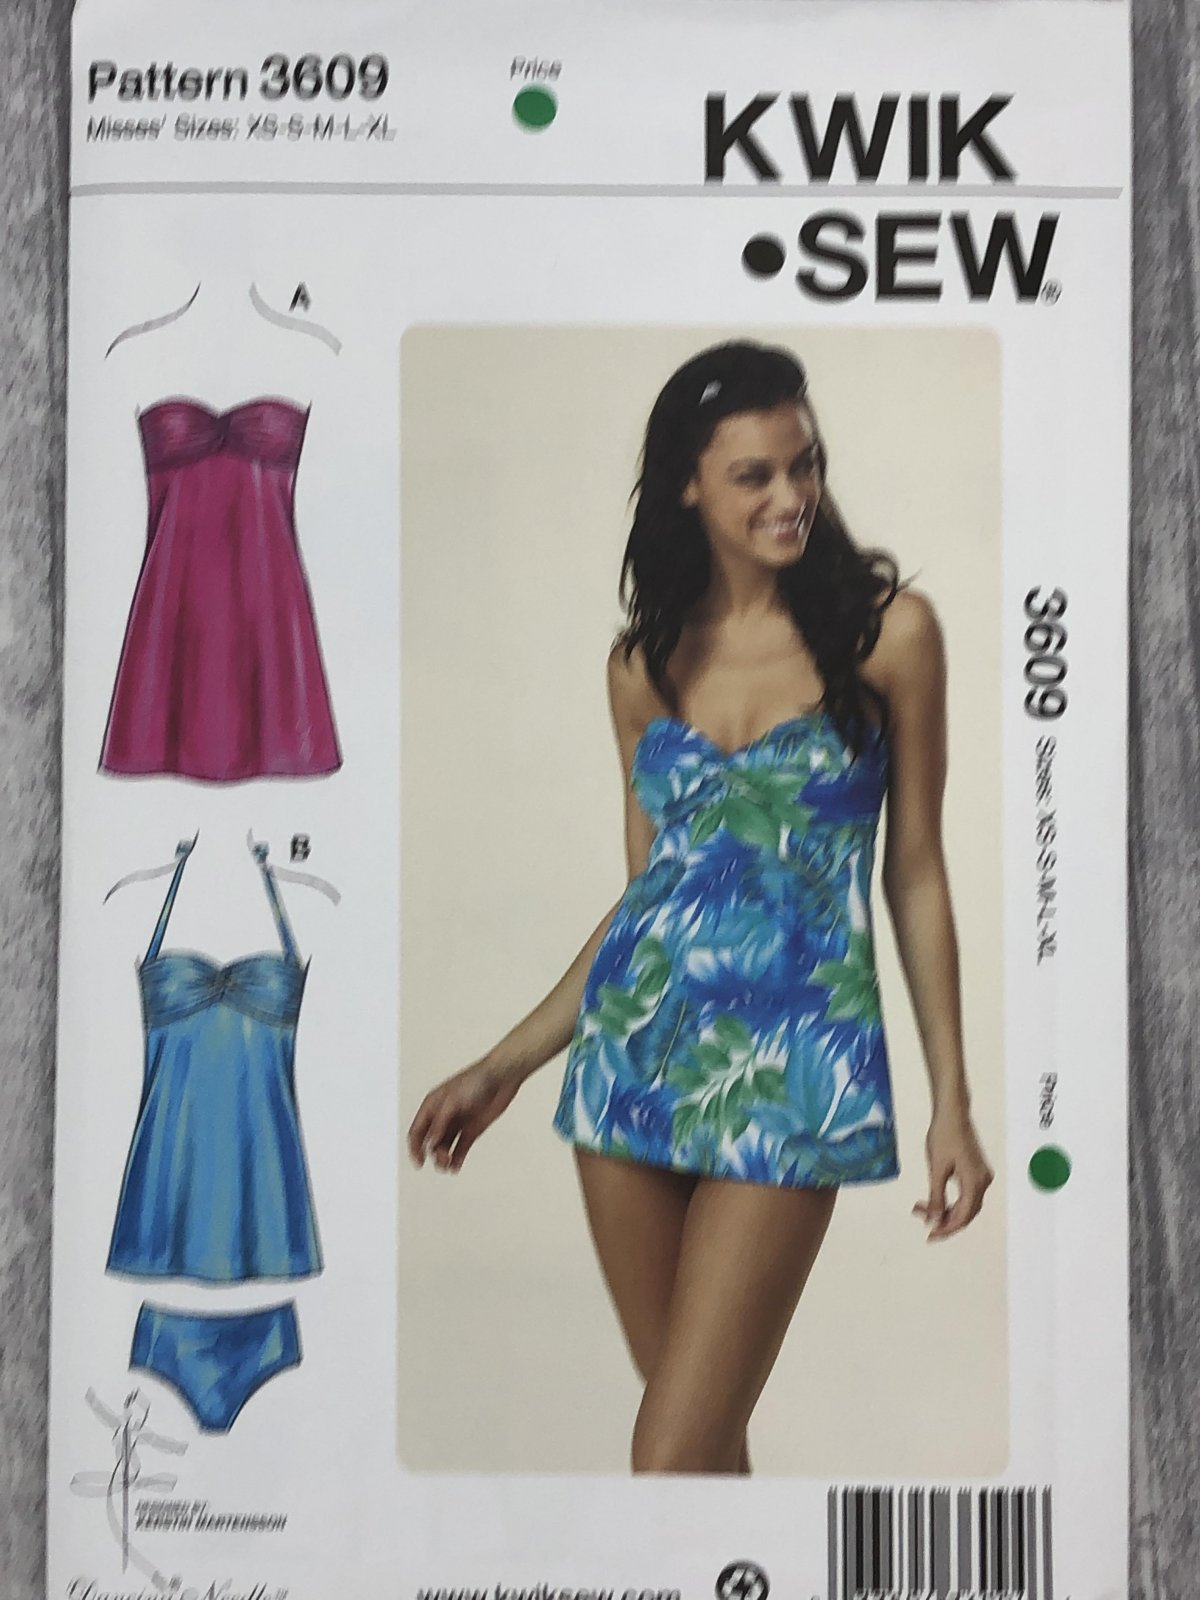 Kwik Sew 3609 Sizes XS-XL